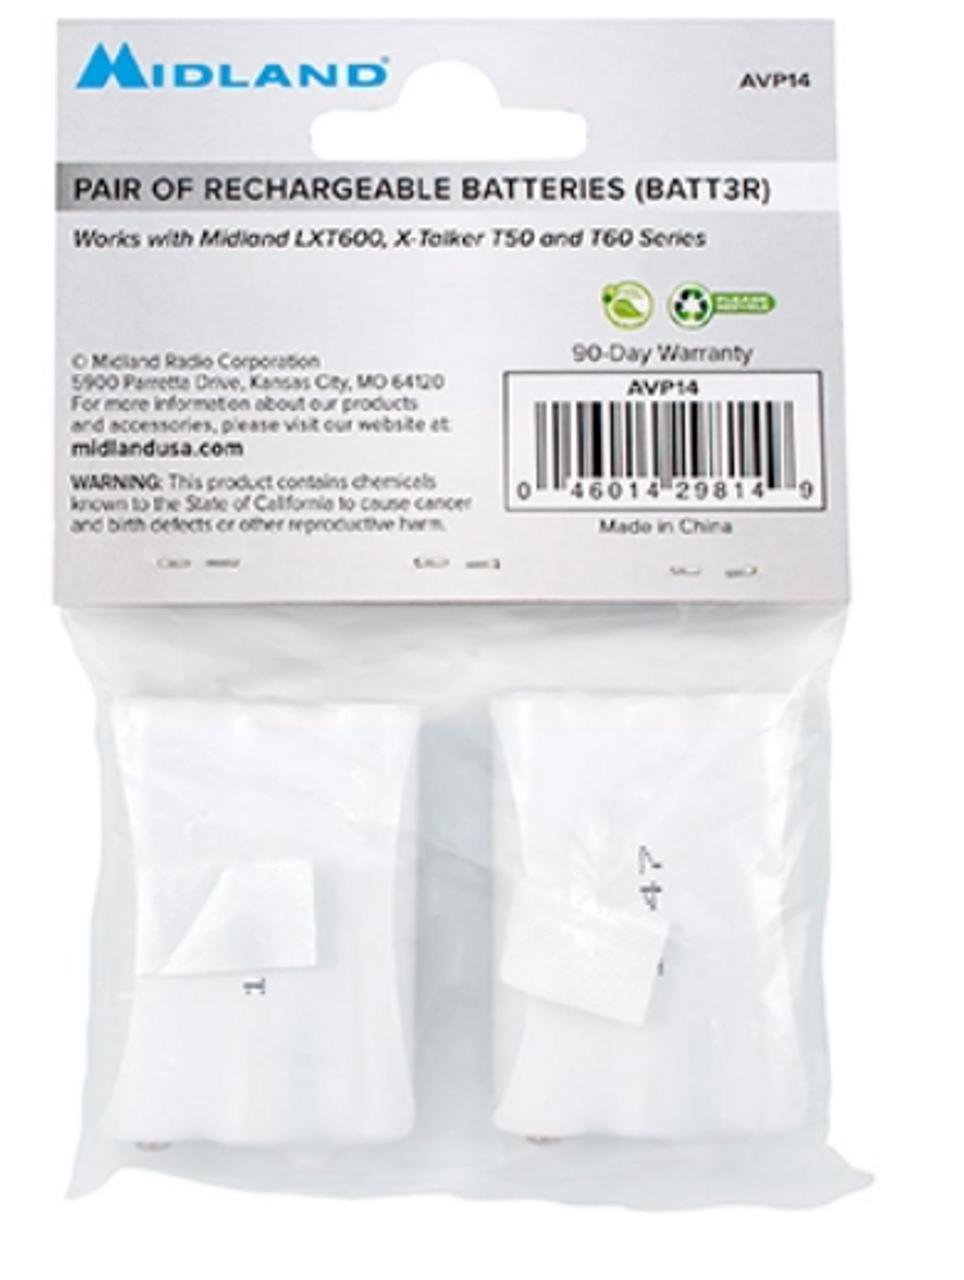 Midland AVP14 batteries are also packaged as BATT3R.